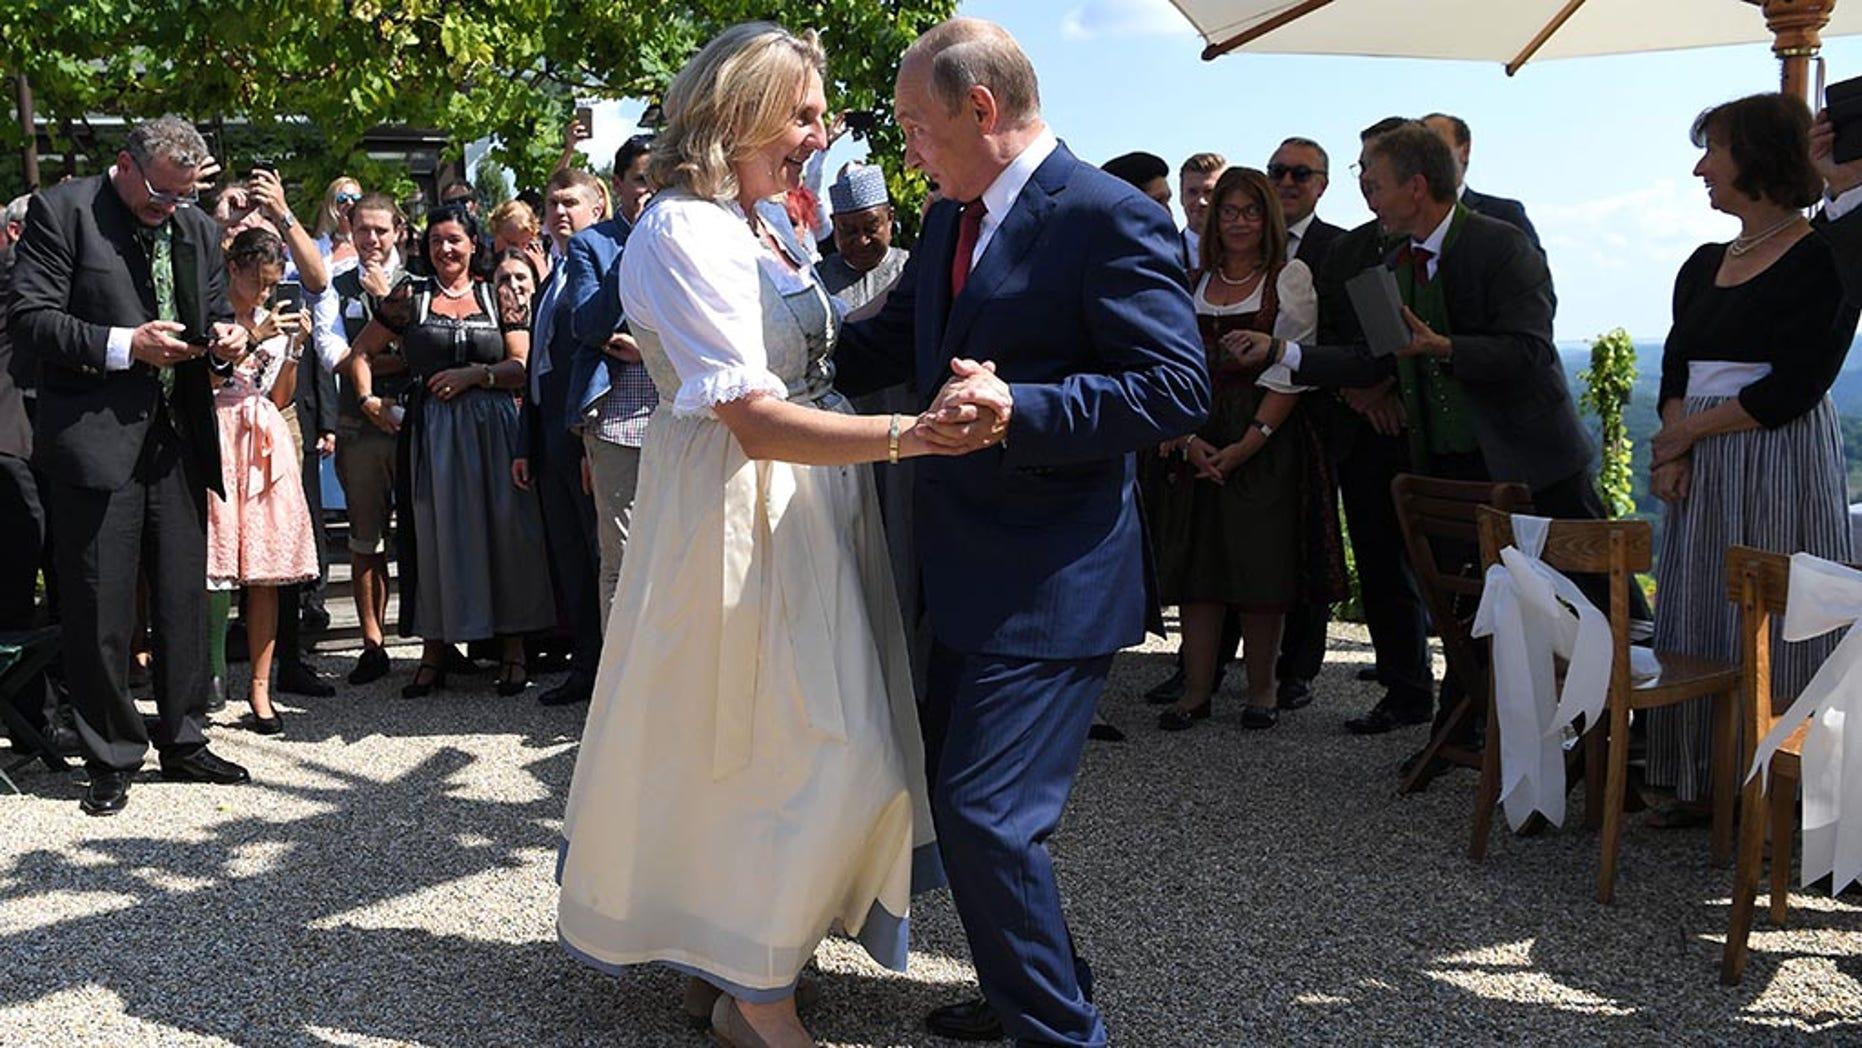 Austria's Foreign Minister Karin Kneissl dances with Russia's President Vladimir Putin at her wedding in Gamlitz, Austria, August 18, 2018. Roland Schlager/Pool via Reuters